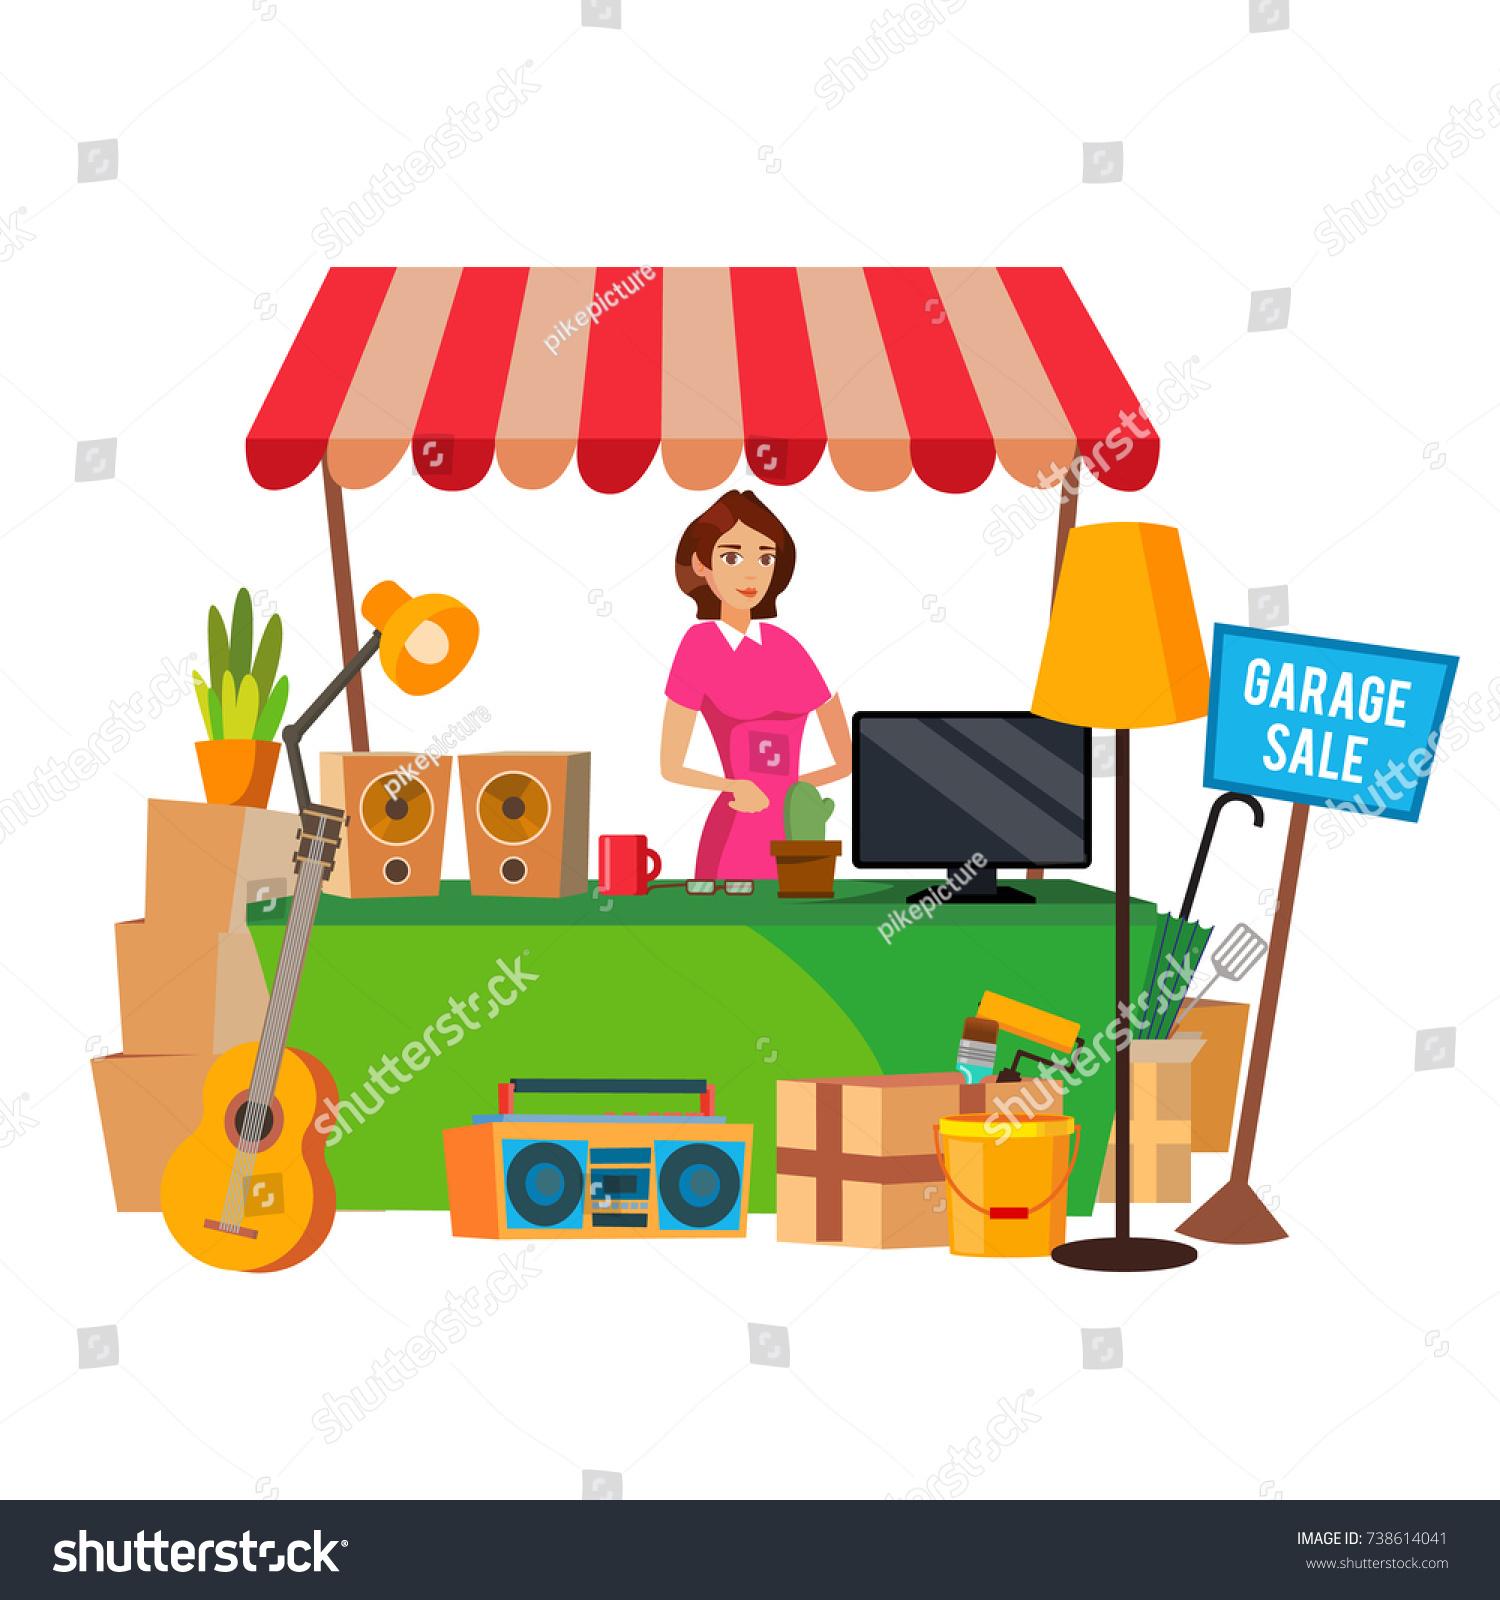 Yard Sale Vector Household Items Woman Manning A Garage Cartoon Character